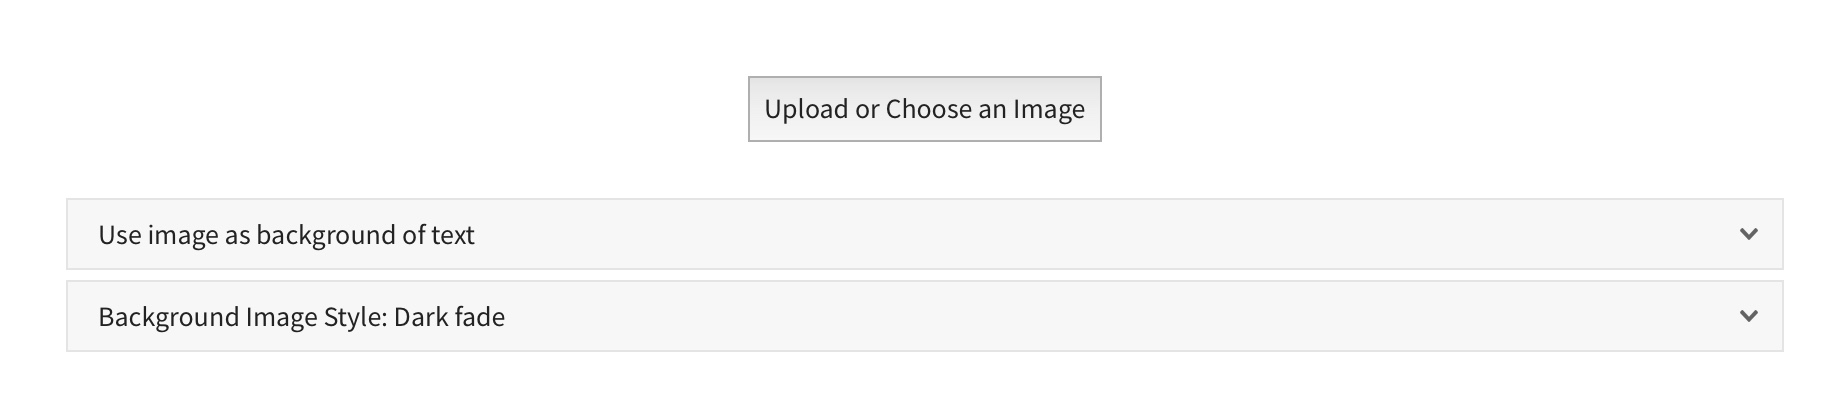 pooldues settings basic block upload image